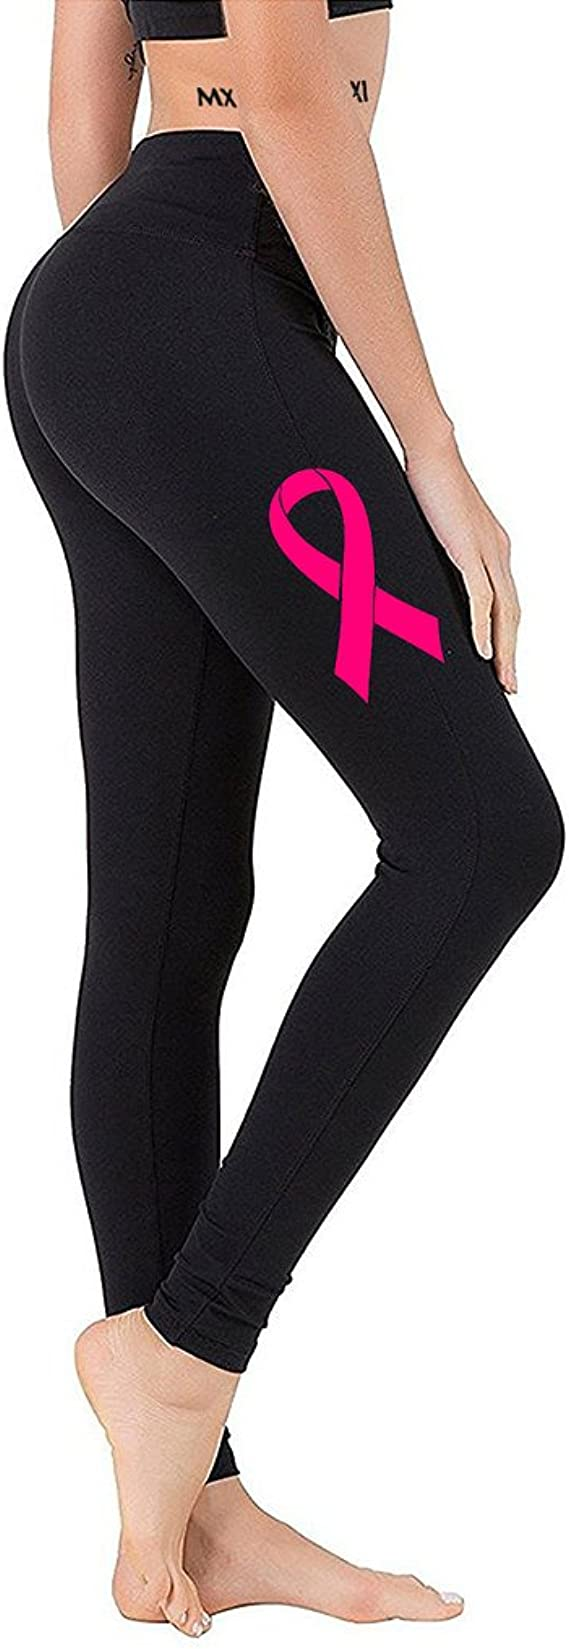 Interstate Apparel Juniors Pink Breast Cancer Ribbon V393 Black Athletic Workout Leggings